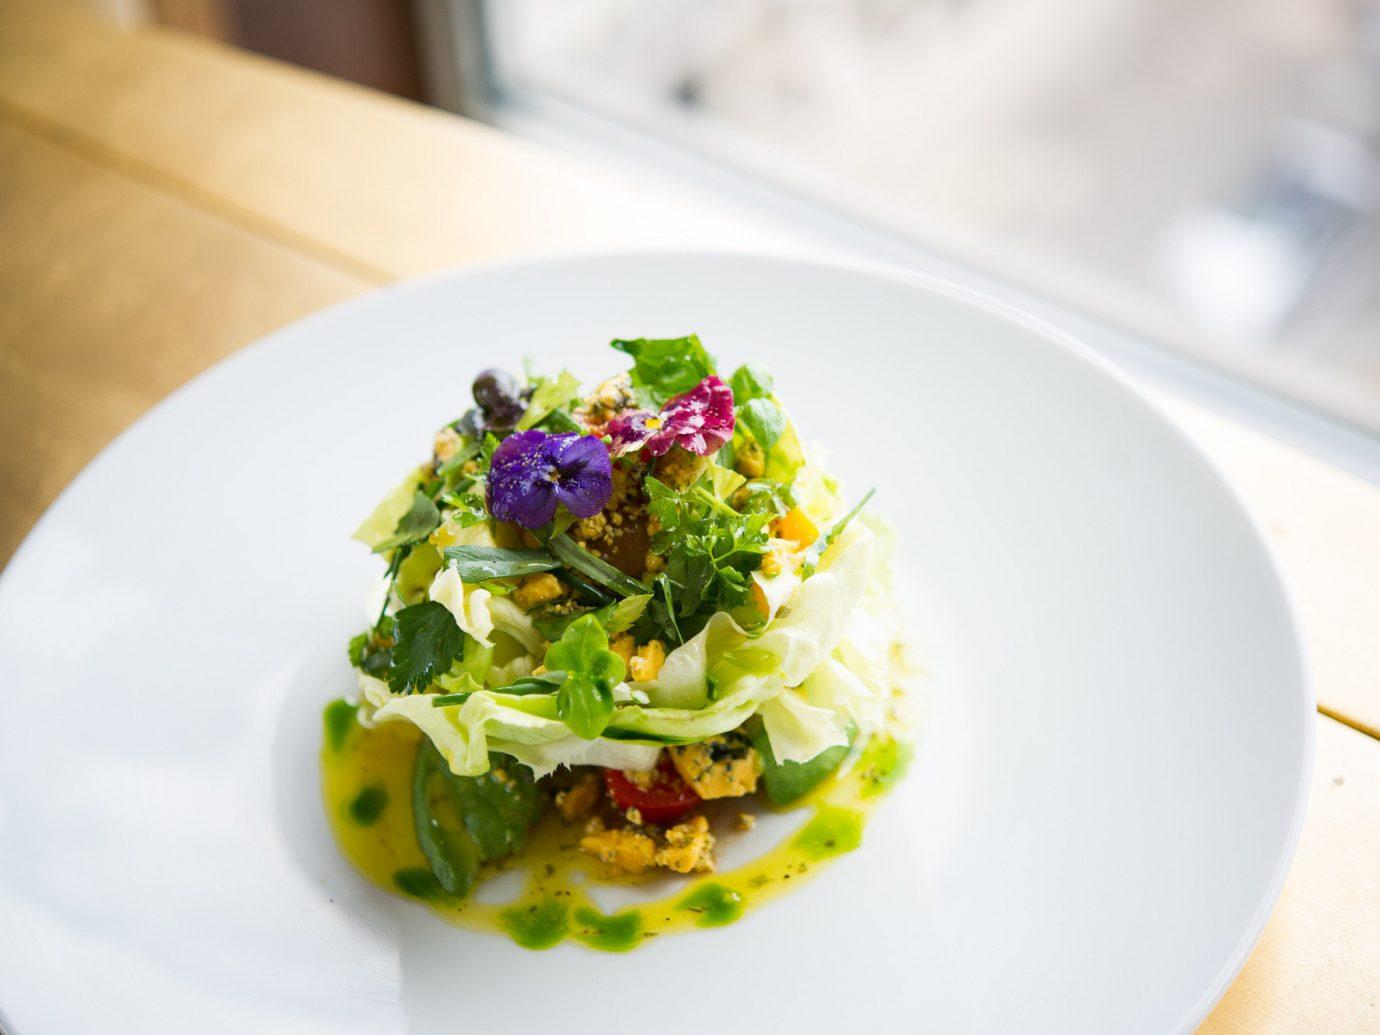 Salad at CUT at 45 Park Lane Restaurant in London